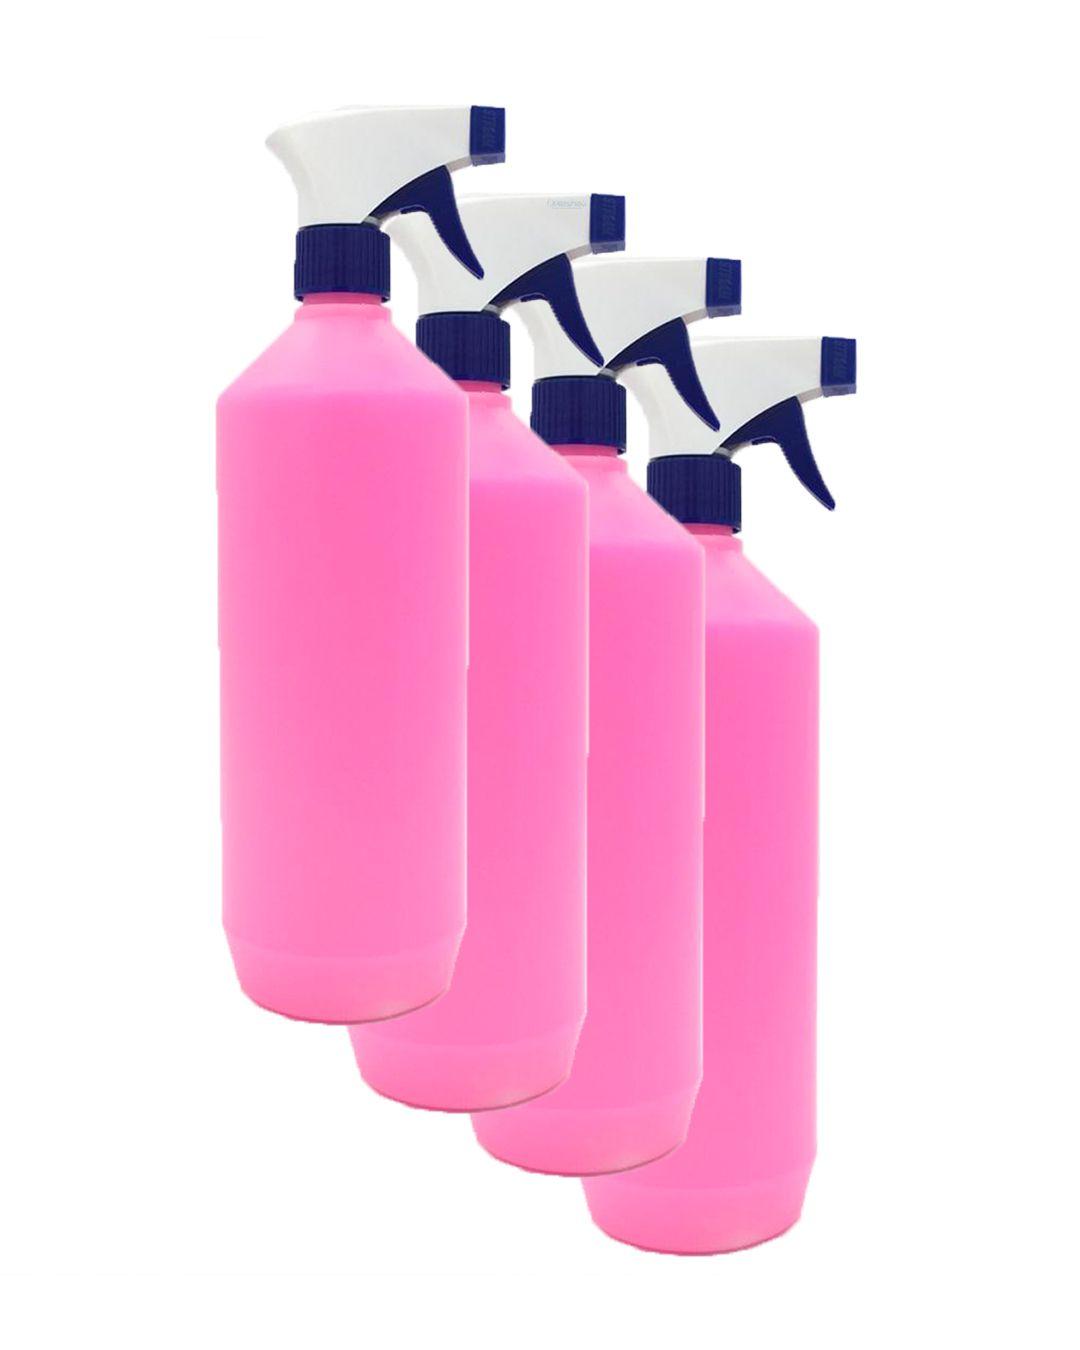 Kit Com 5bactericida Aromatizante Ar Condicionado 1l Darling